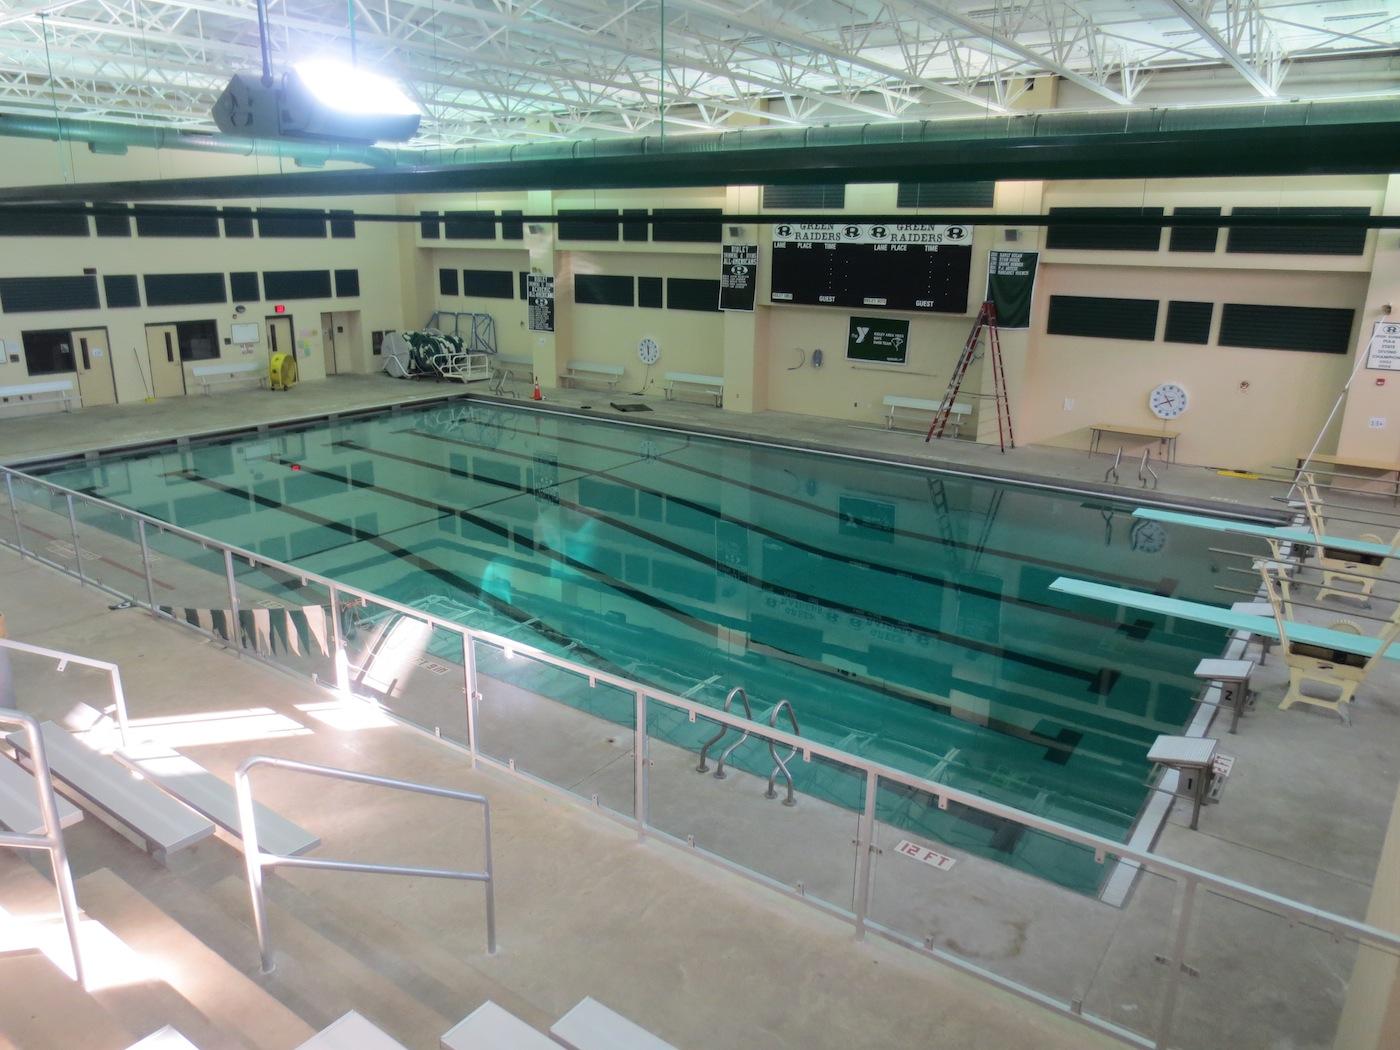 Midatlantic commercial aquatics trenton new jersey for Pool design inc bordentown nj